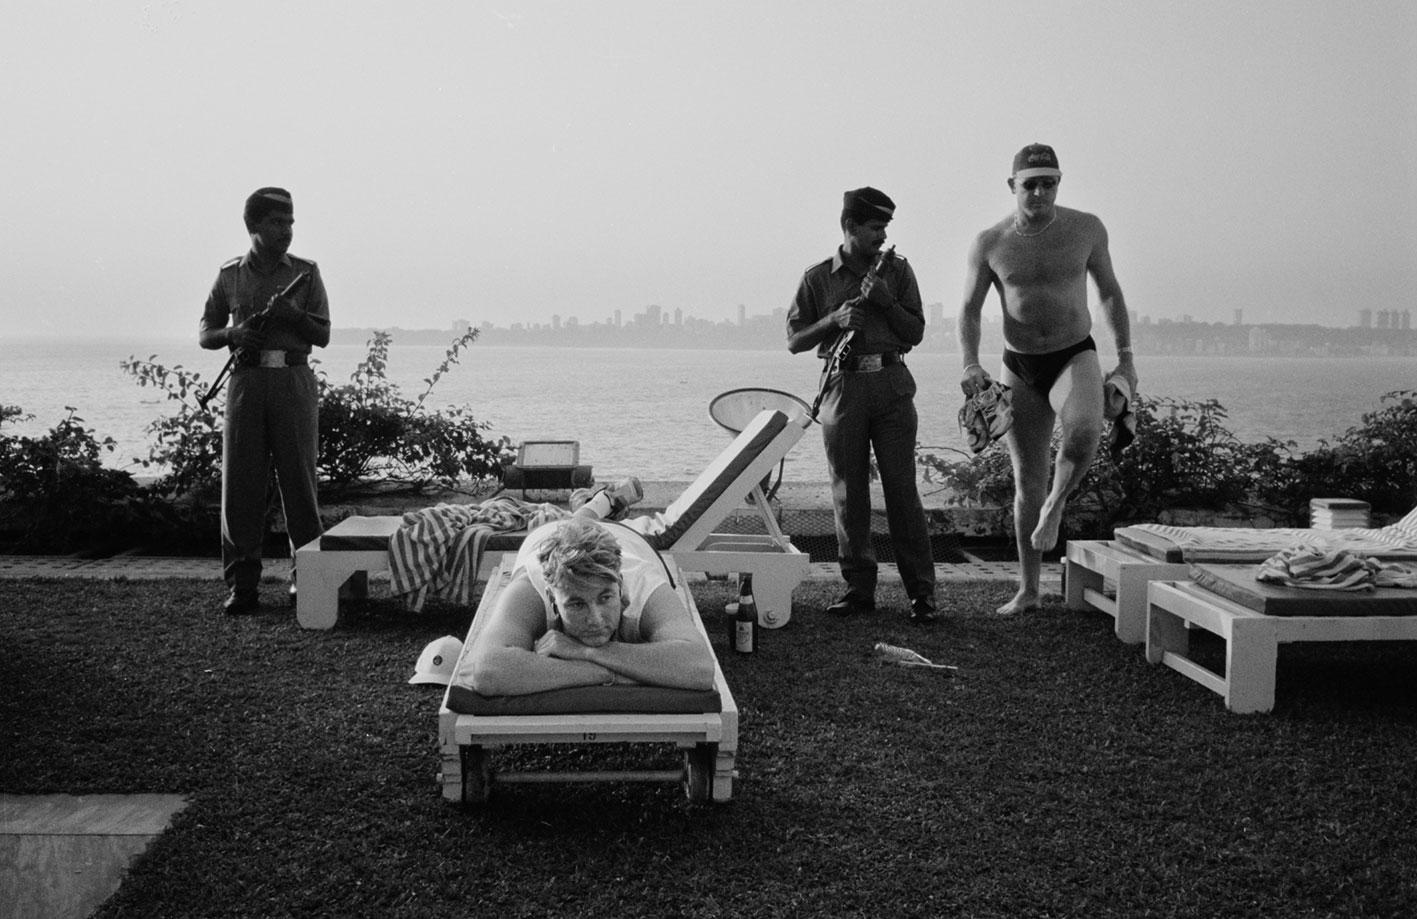 Shane Lee and Craig McDermott at hotel poolside // Trent Parke / Magnum Photos